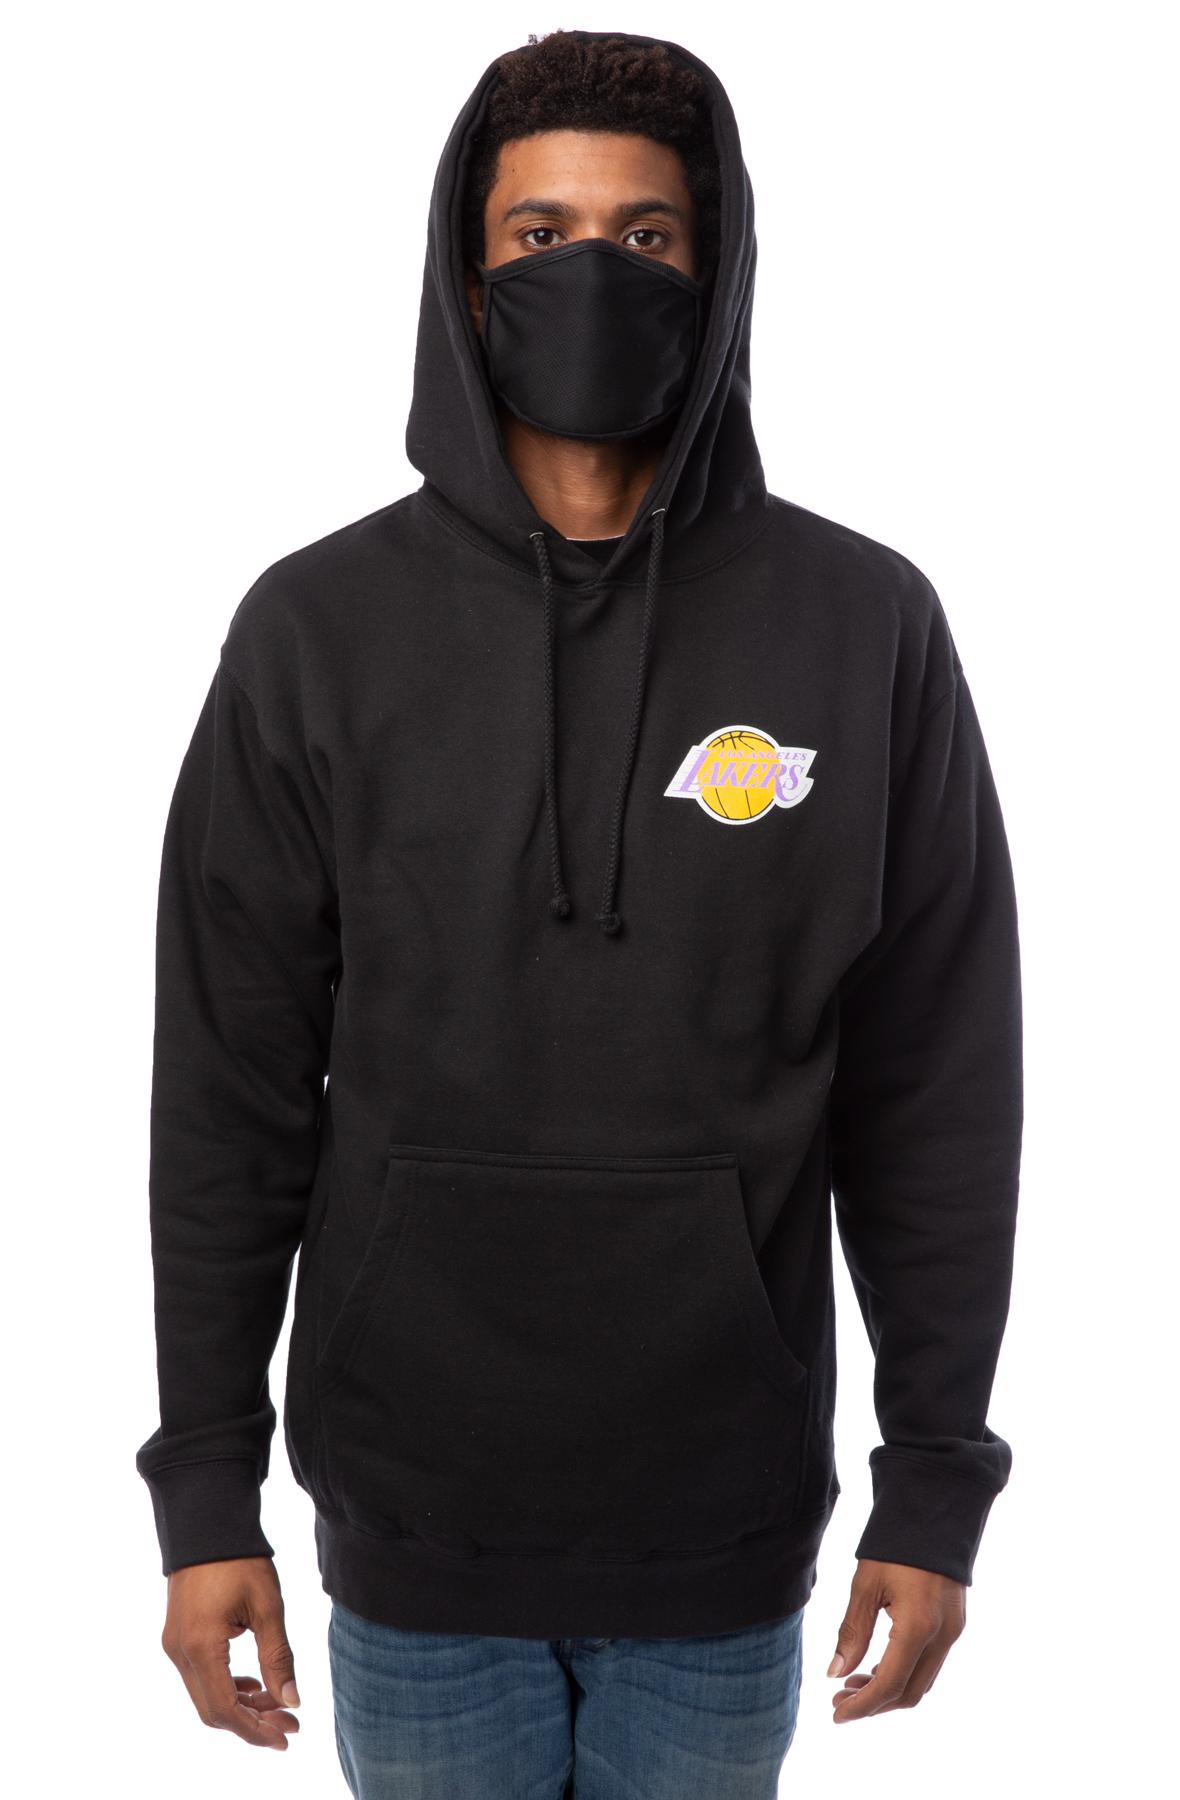 NBA Showtime 17x Lakers Hoodie Black